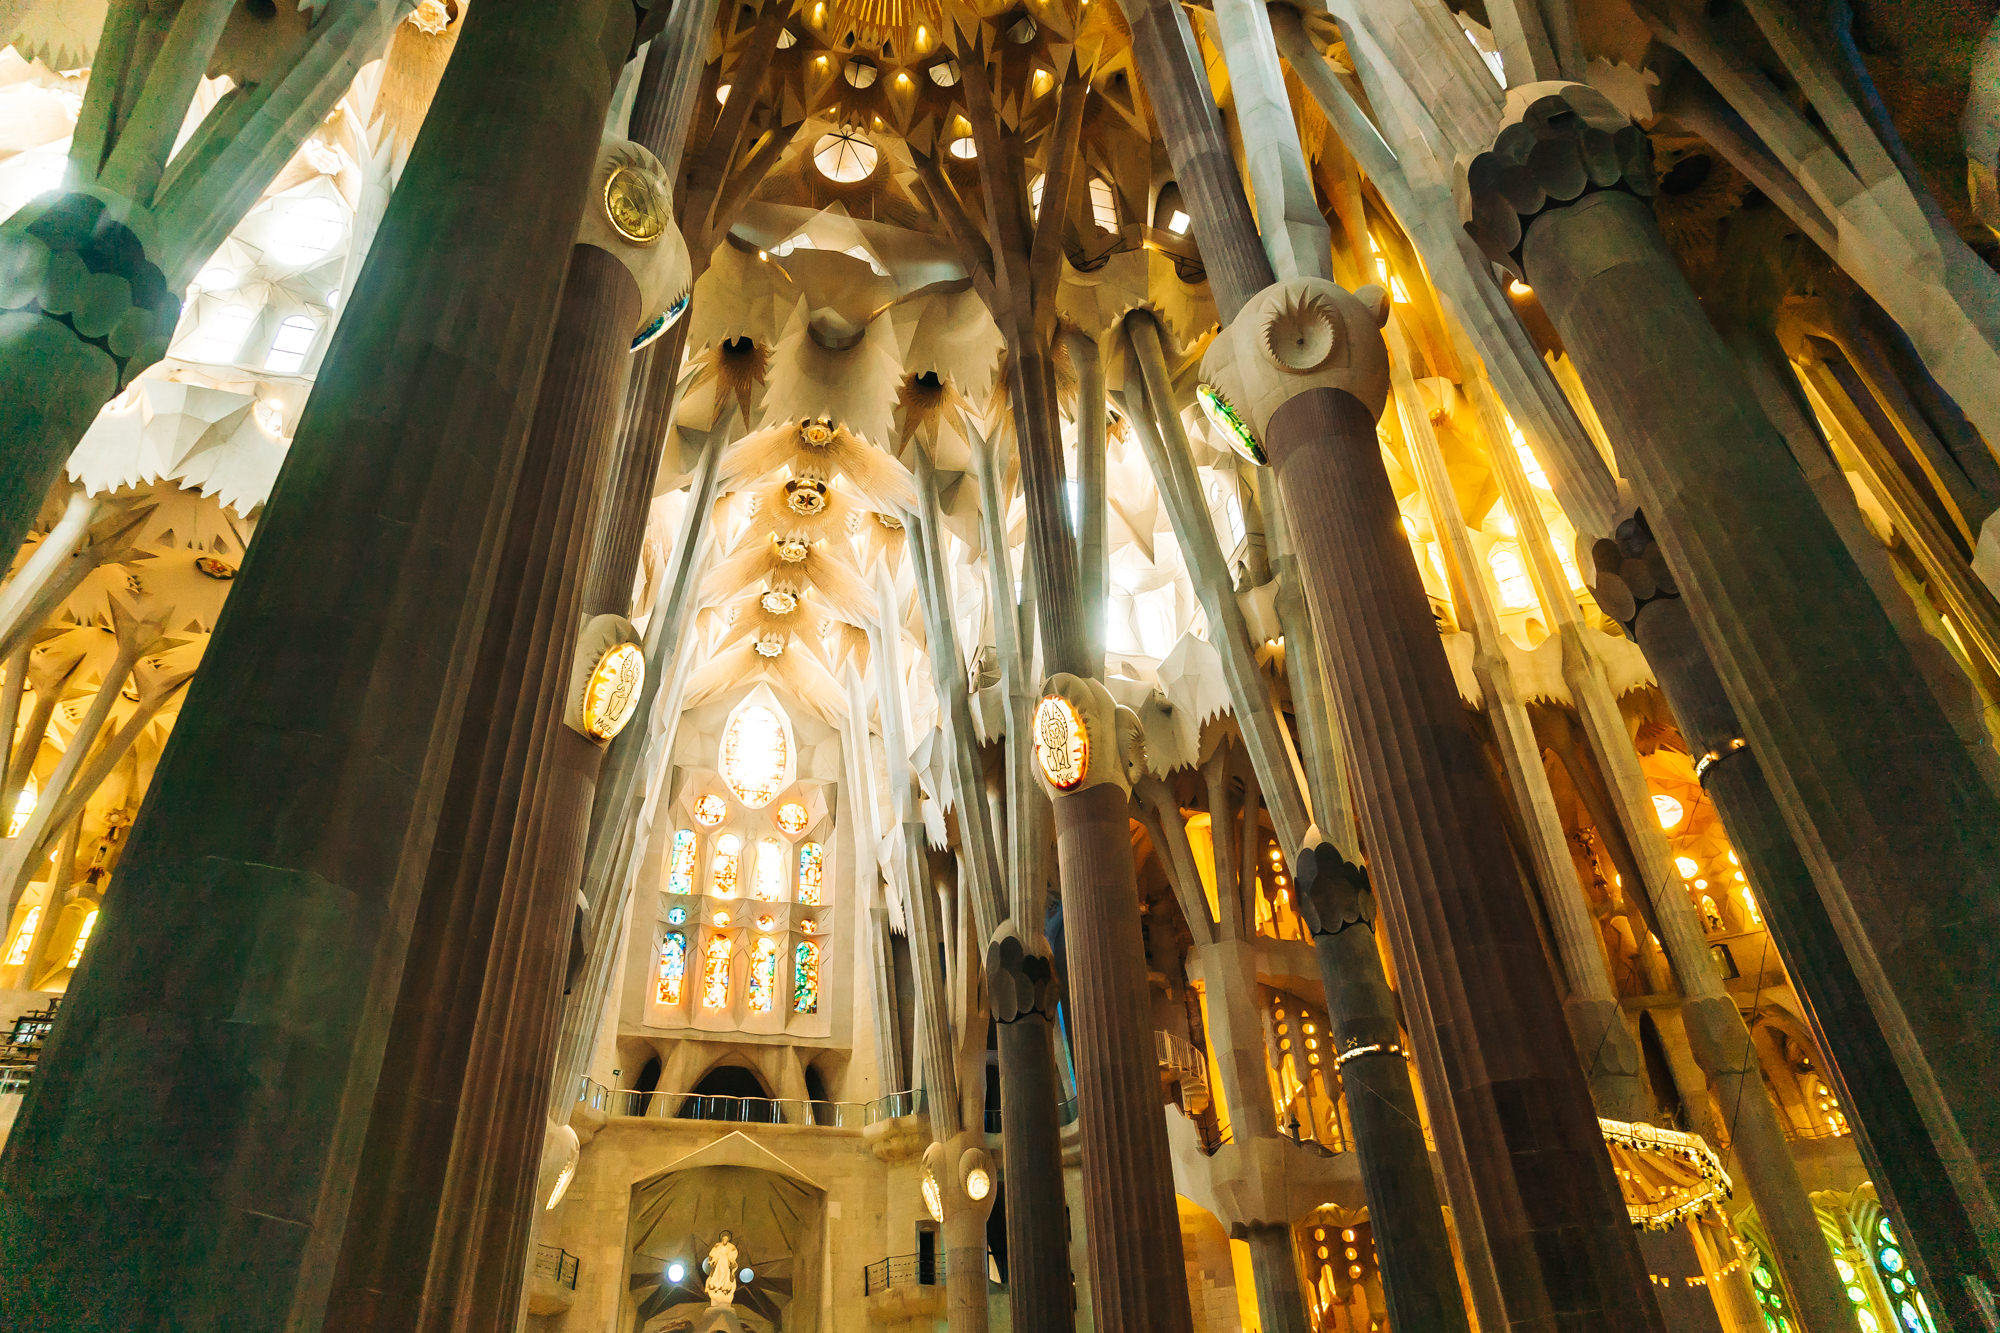 the extraordinary interior of La Sagrada Familia